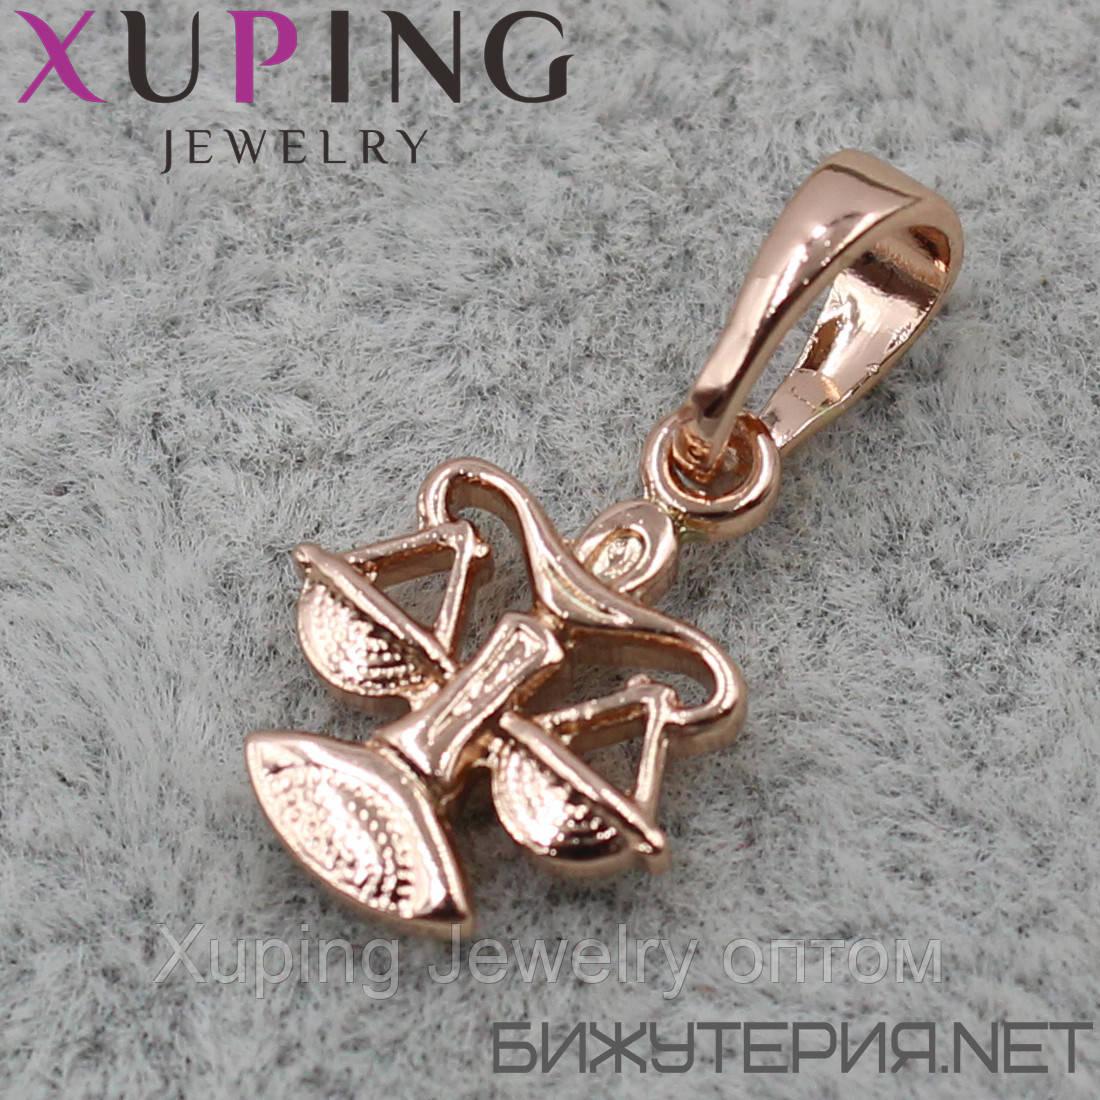 Знак Зодиака Весы Xuping медицинское золото 18K Gold - 1021168802